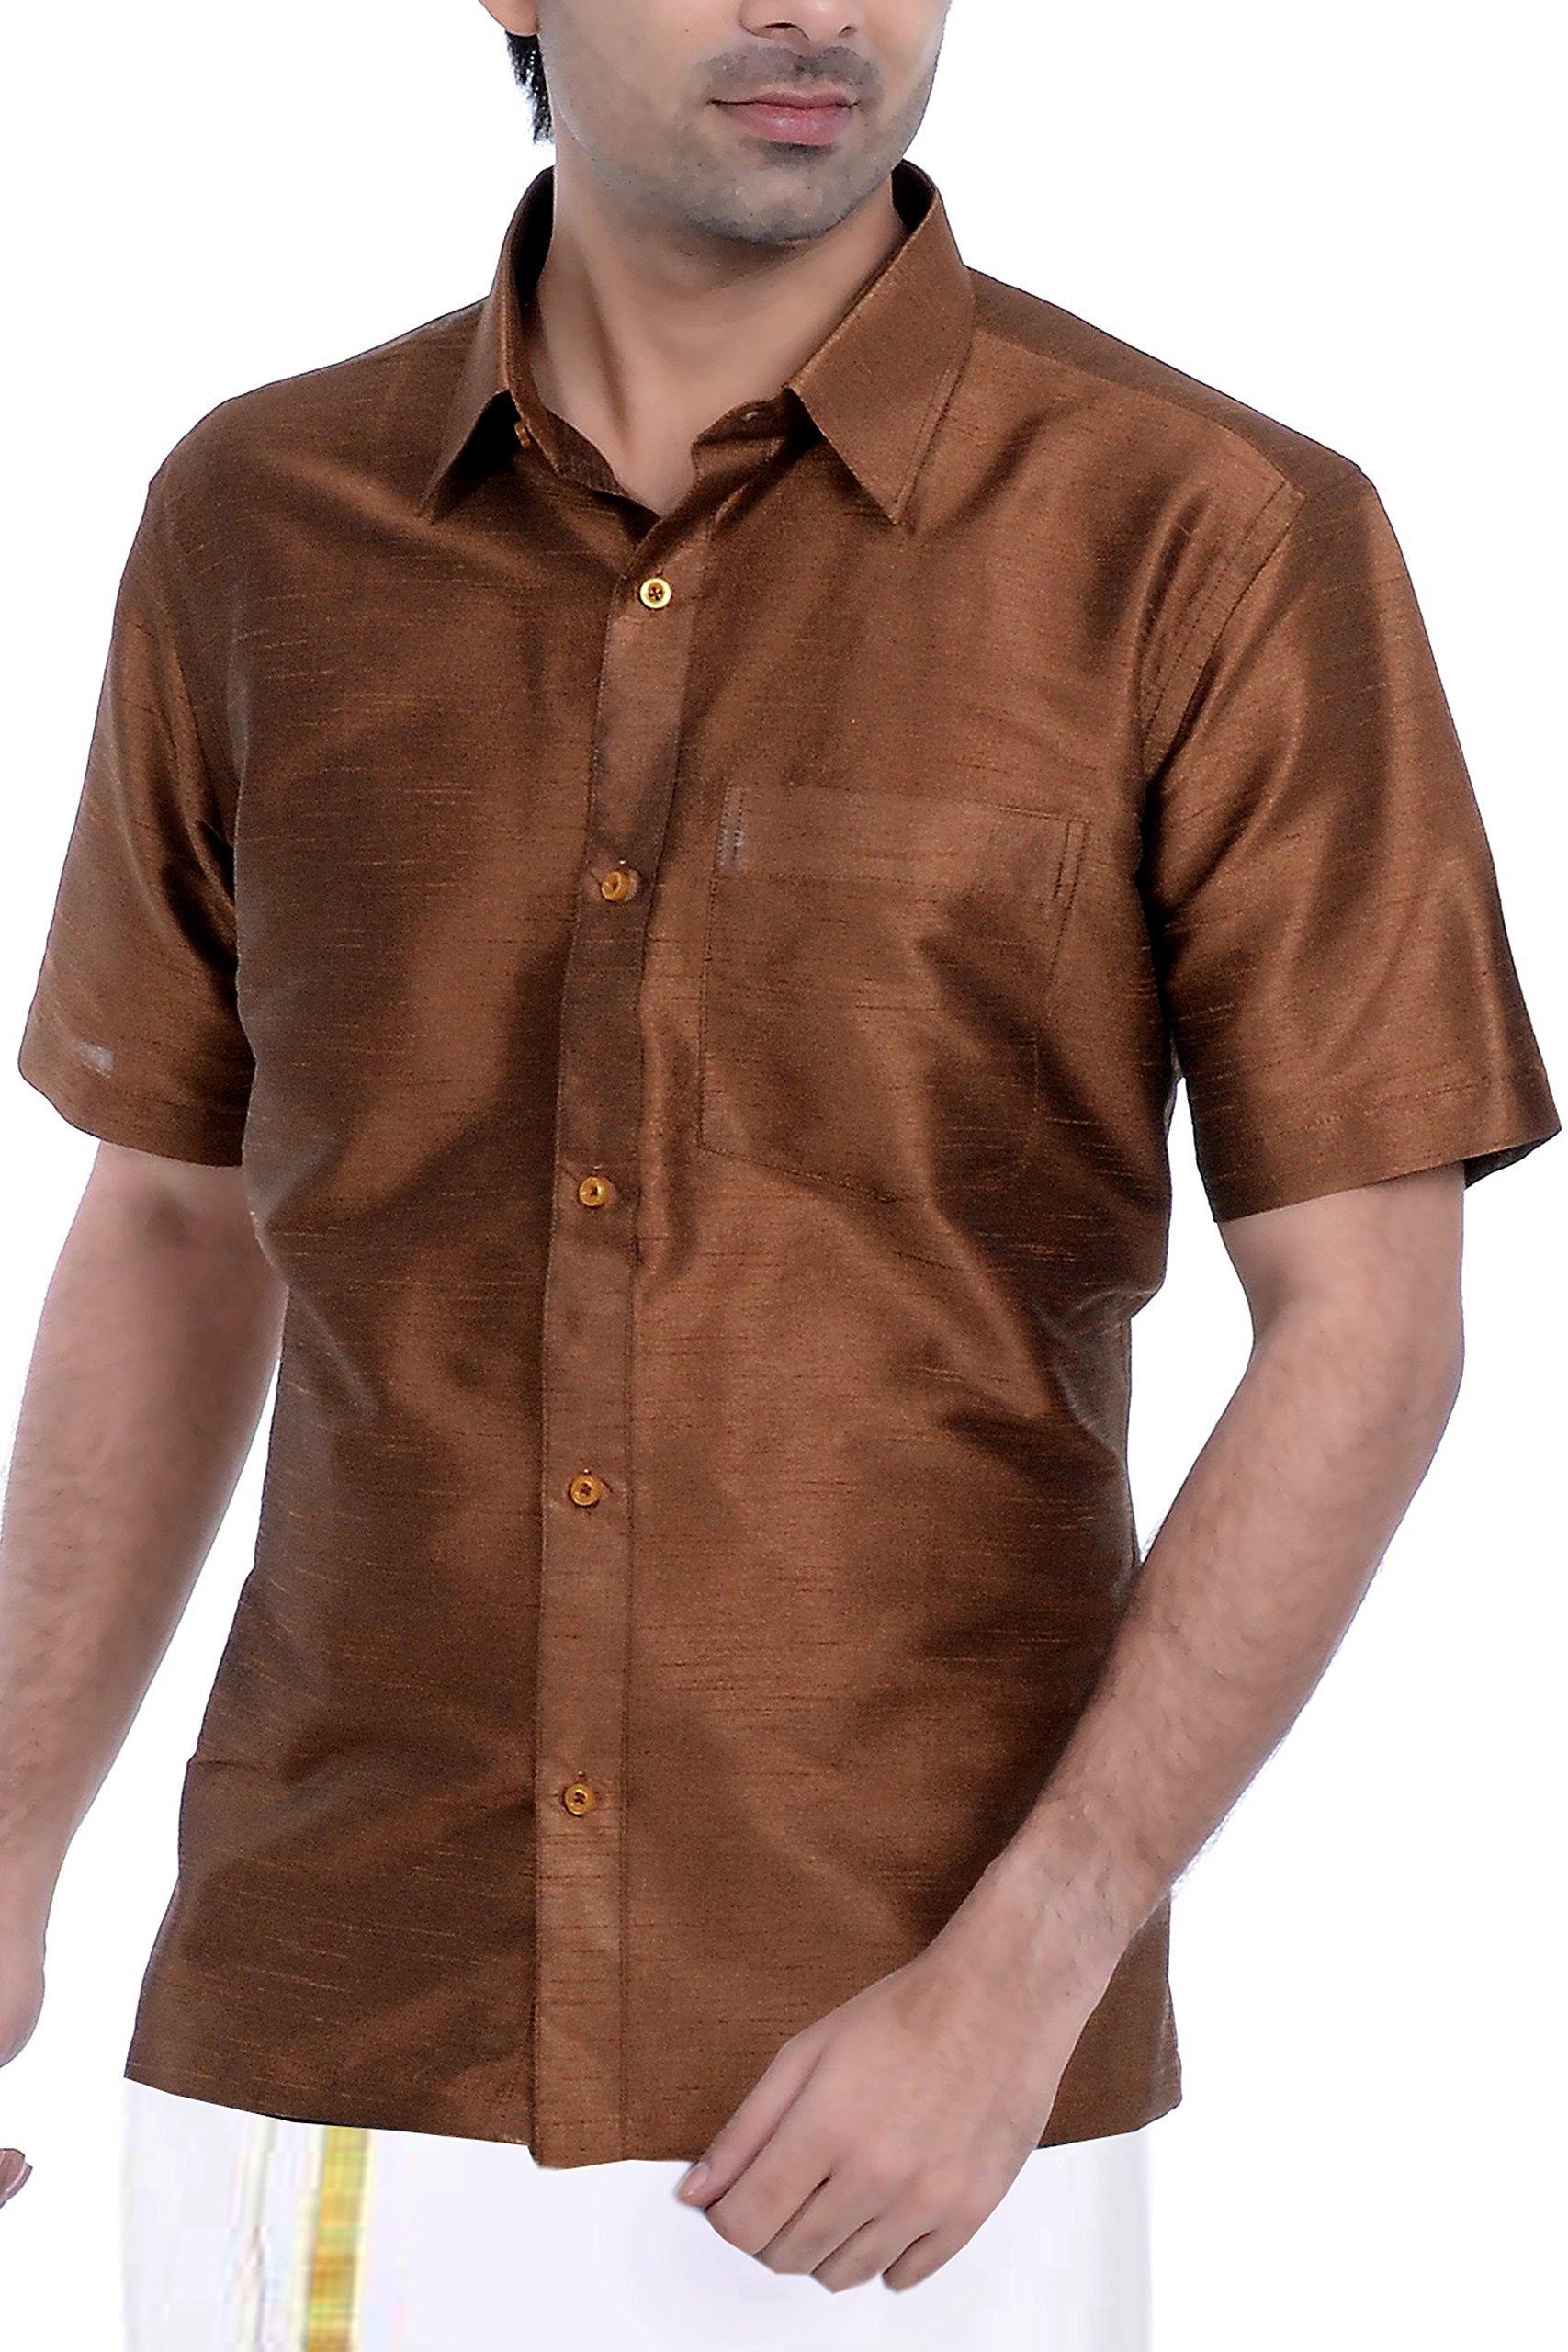 Vastramay Men's Cotton Silk Solid Casual Shirt 42 Brown